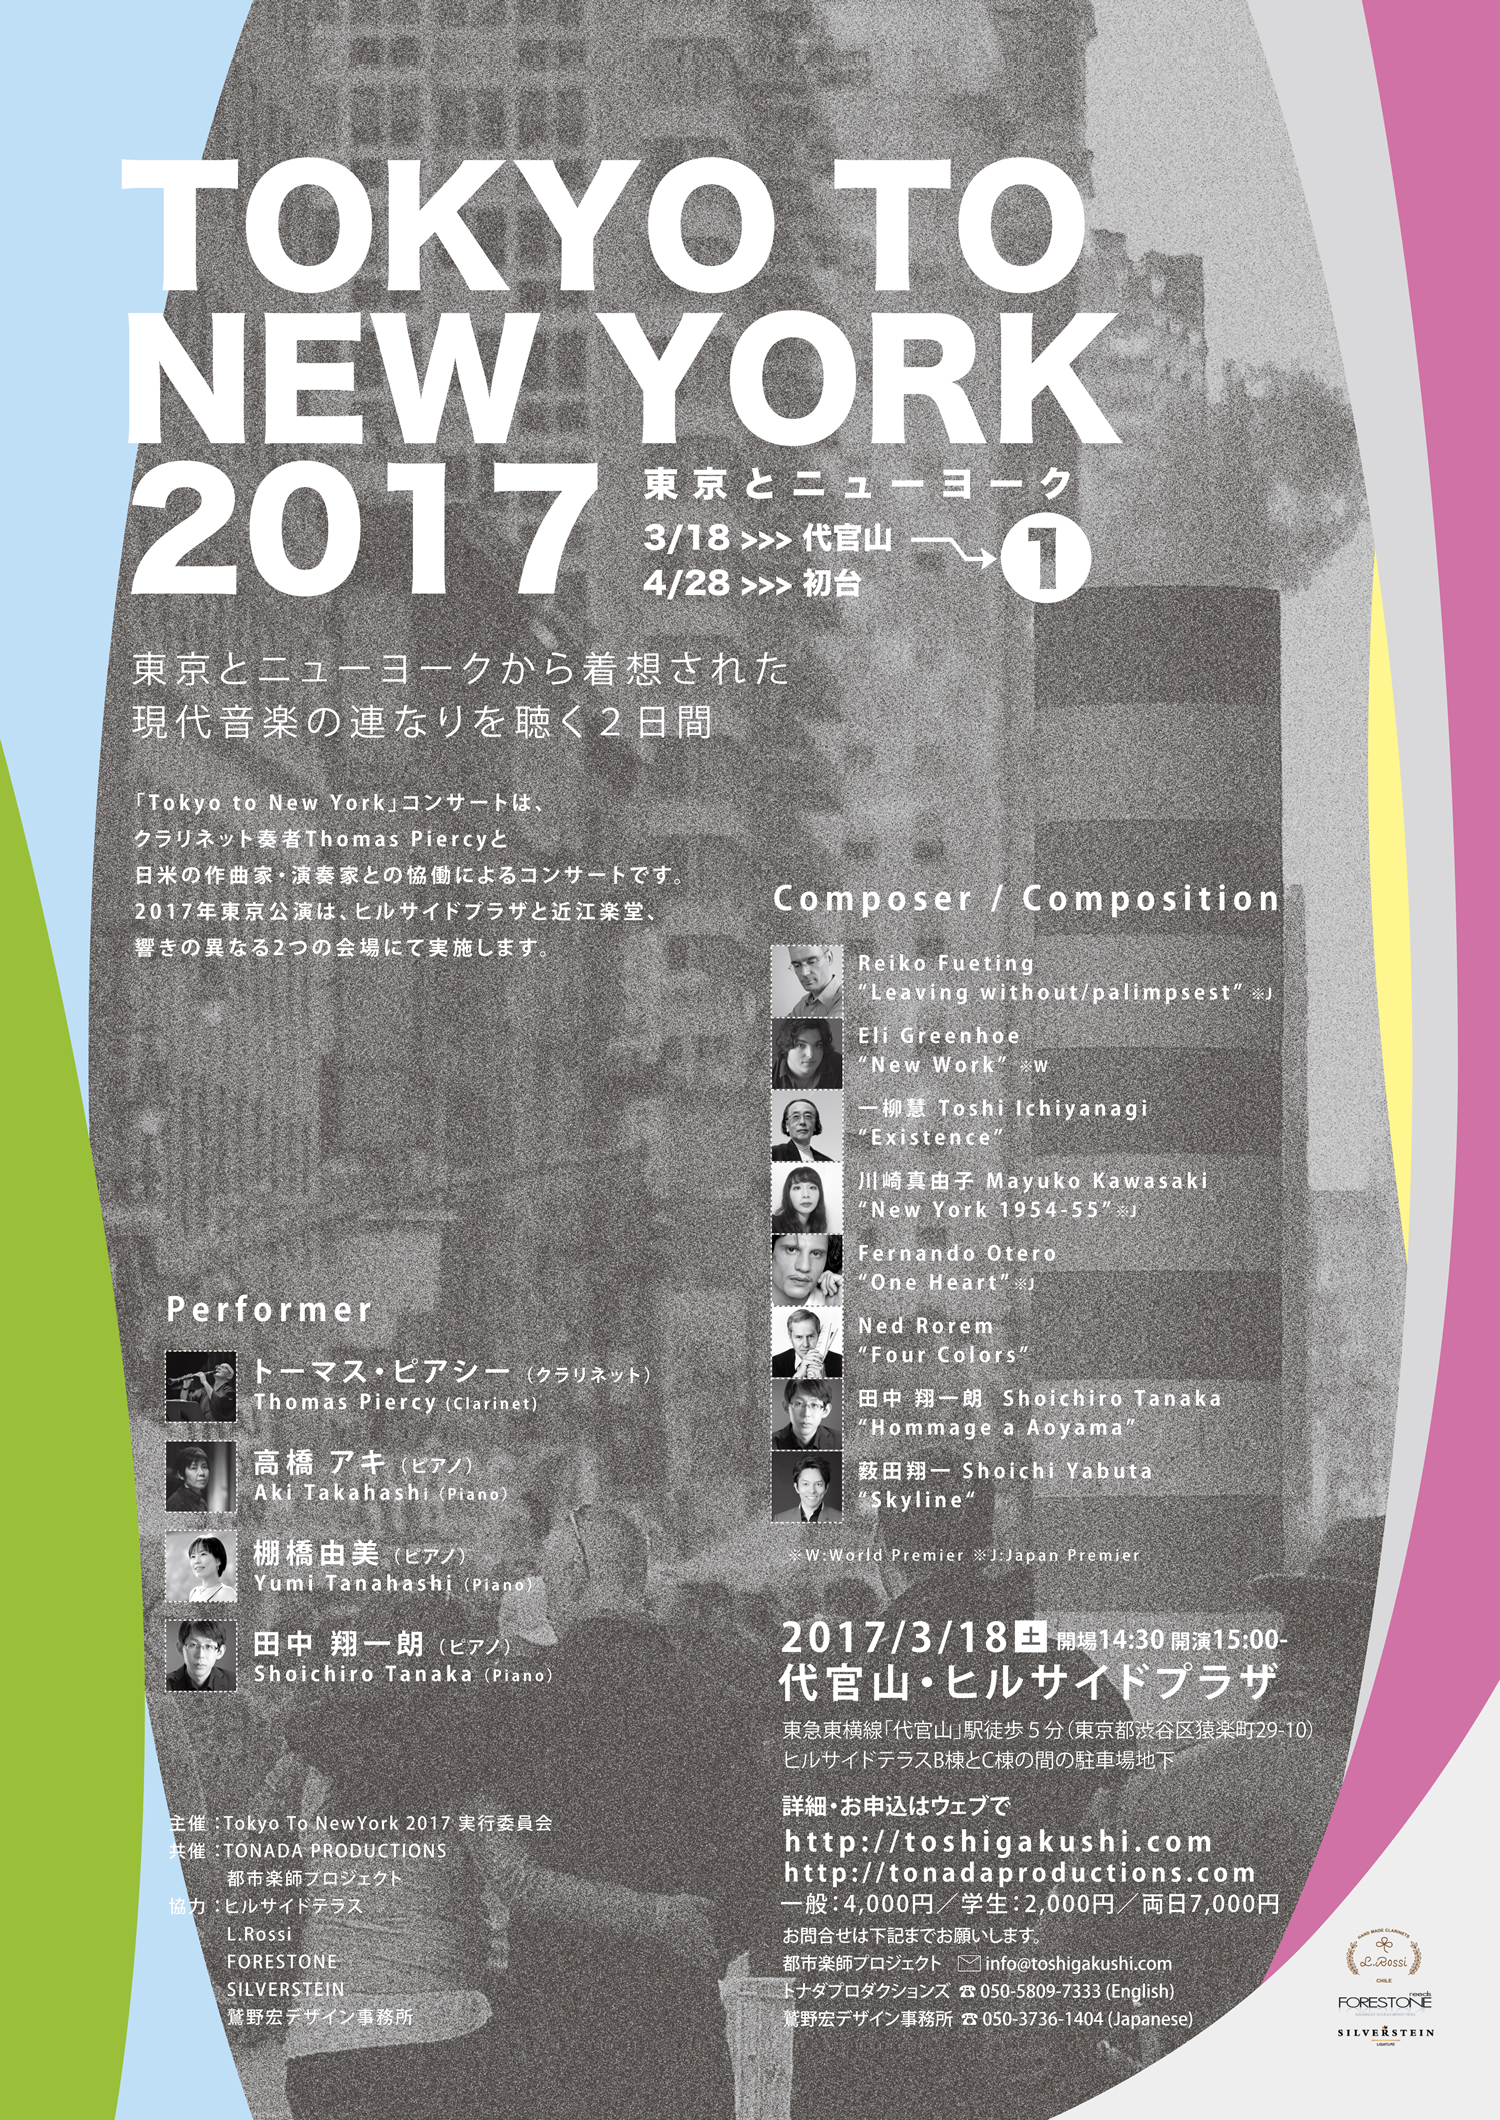 Tokyo To NewYork 2017 3/18